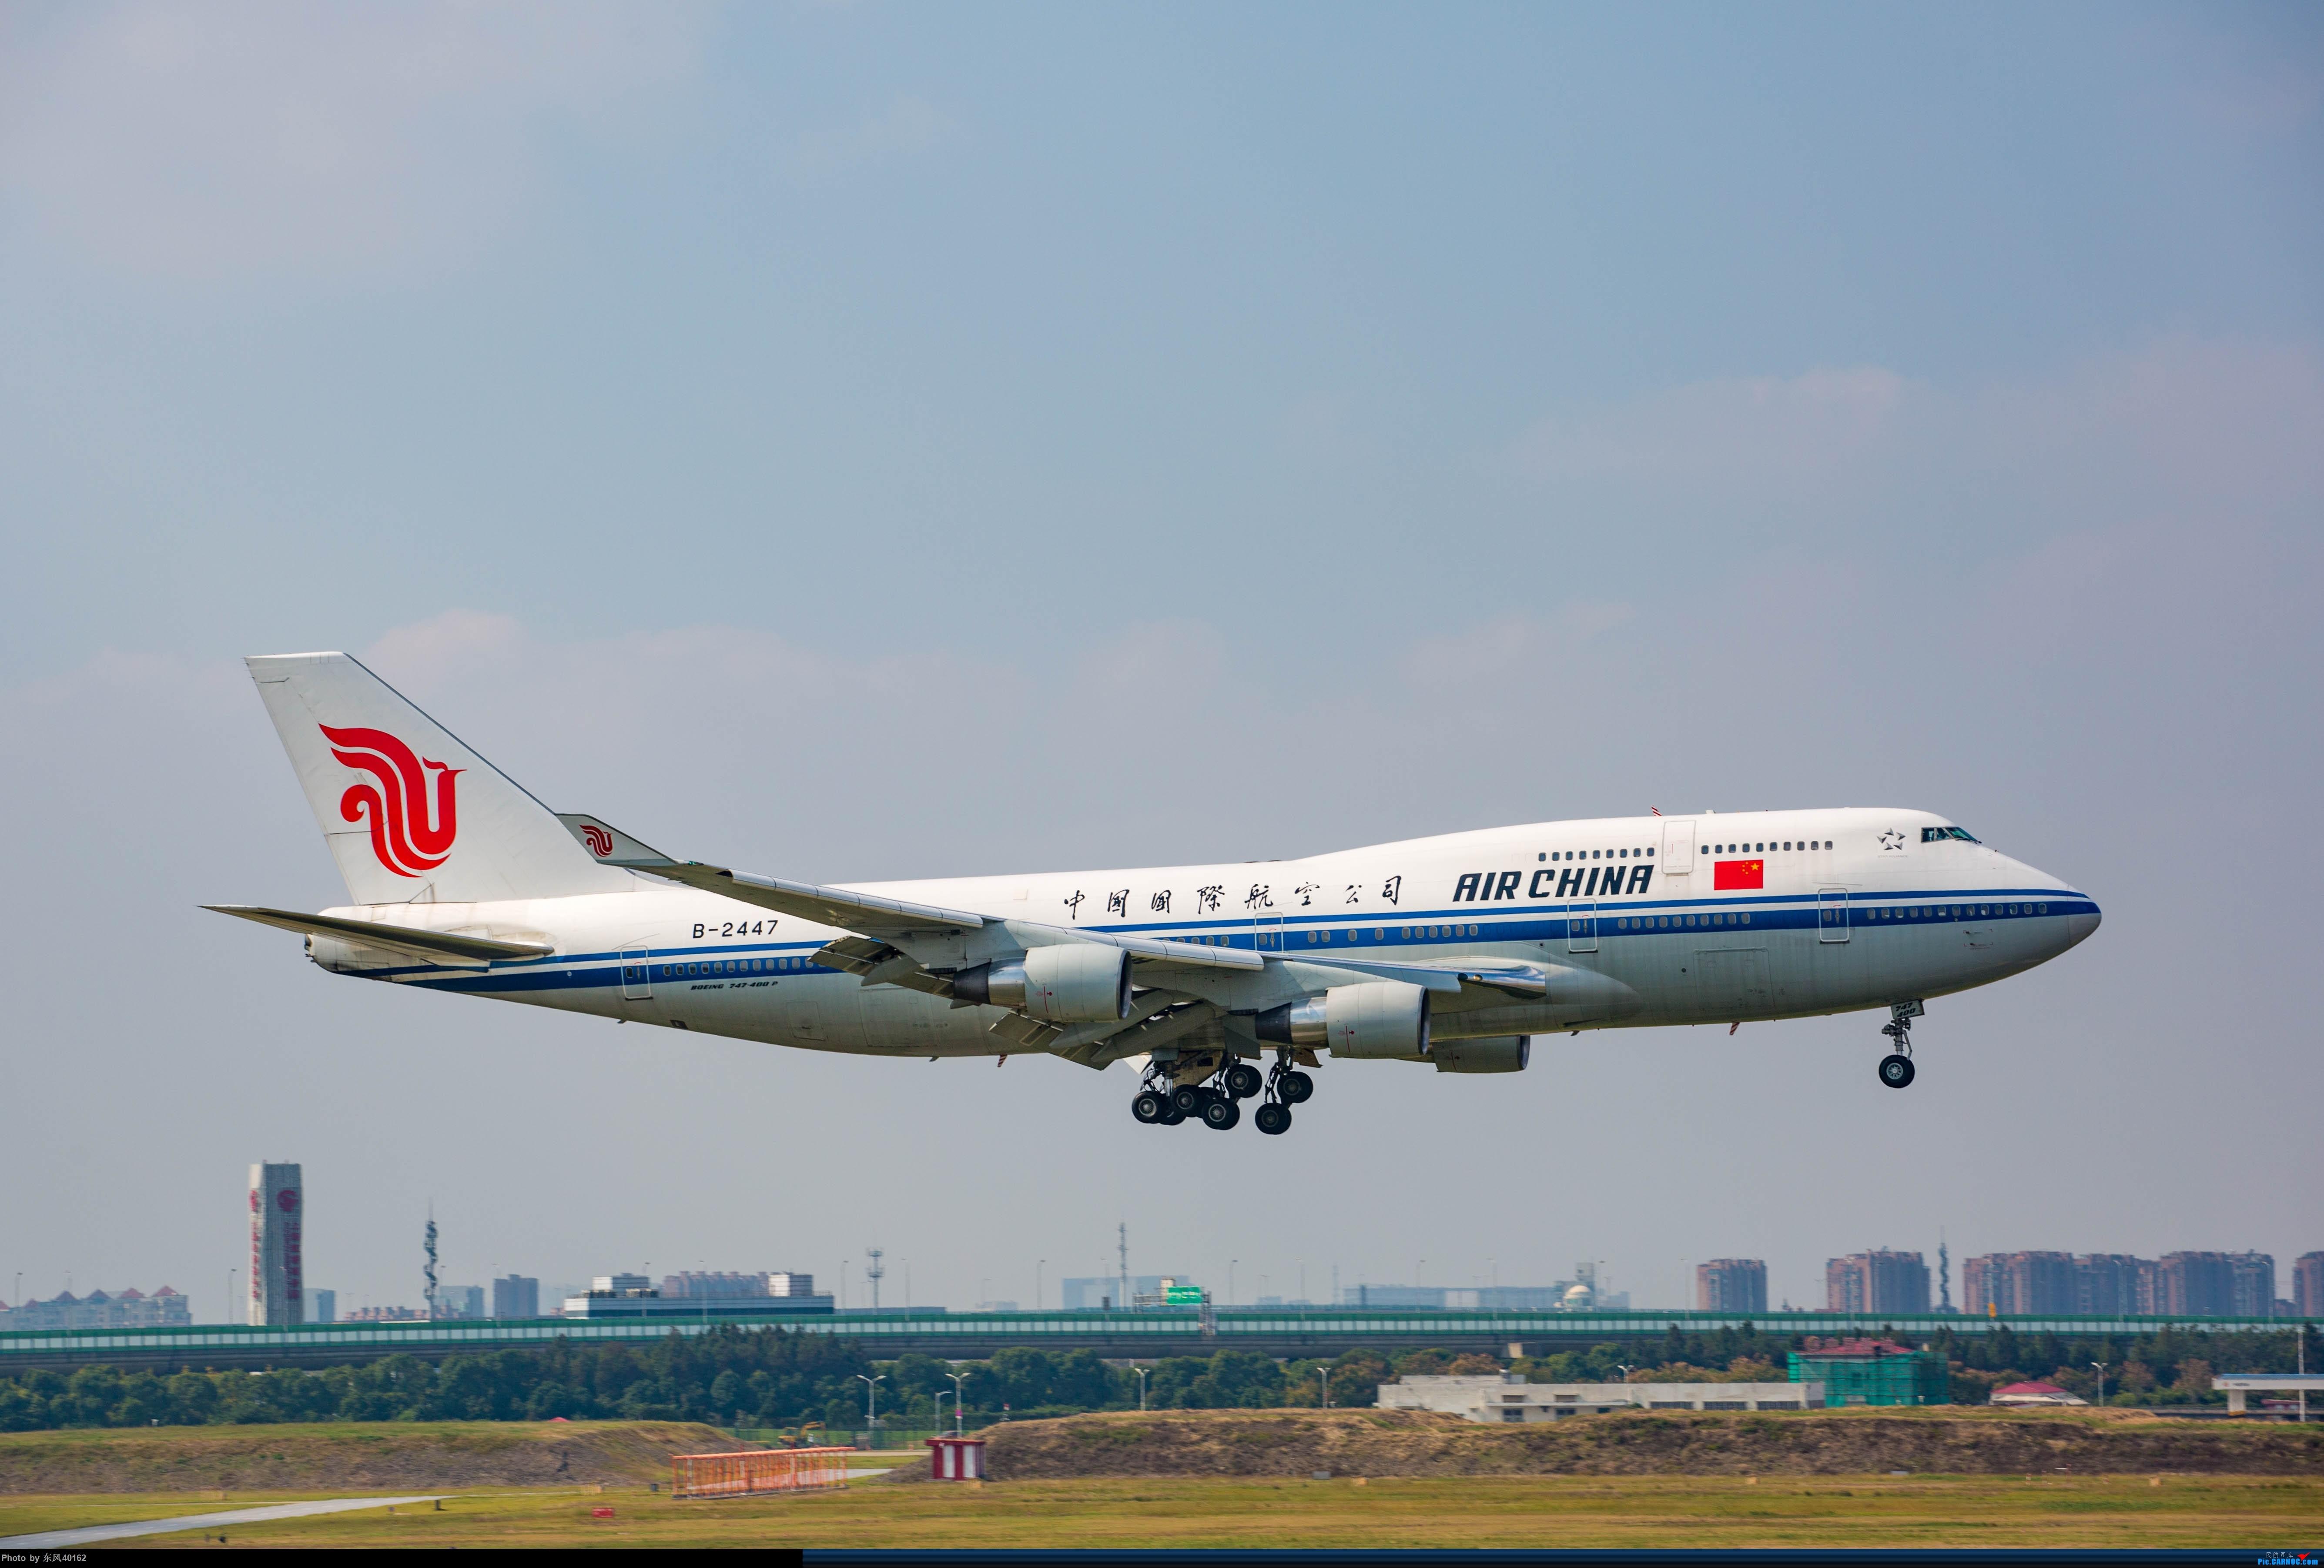 Re:[原创][SHA]虹桥拍机,B-2447、上航767等 BOEING 747-400 B-2447 中国上海虹桥国际机场